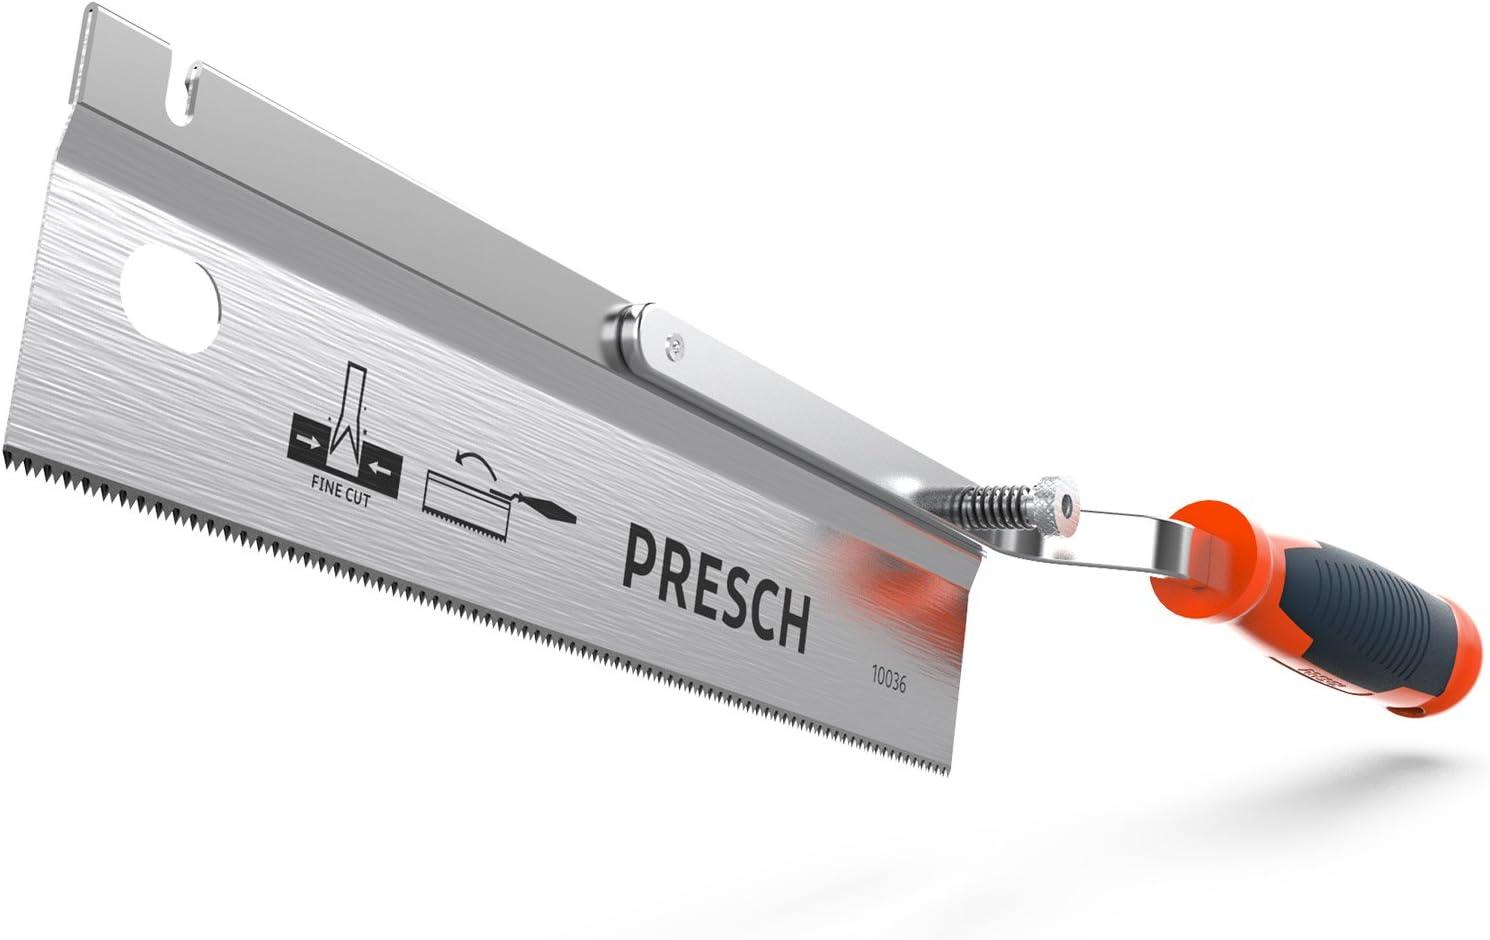 Presch sierra acodada orientable 250mm - sierra manual ajustable plegable acodada madera, plástico, PVC, estuco, yeso